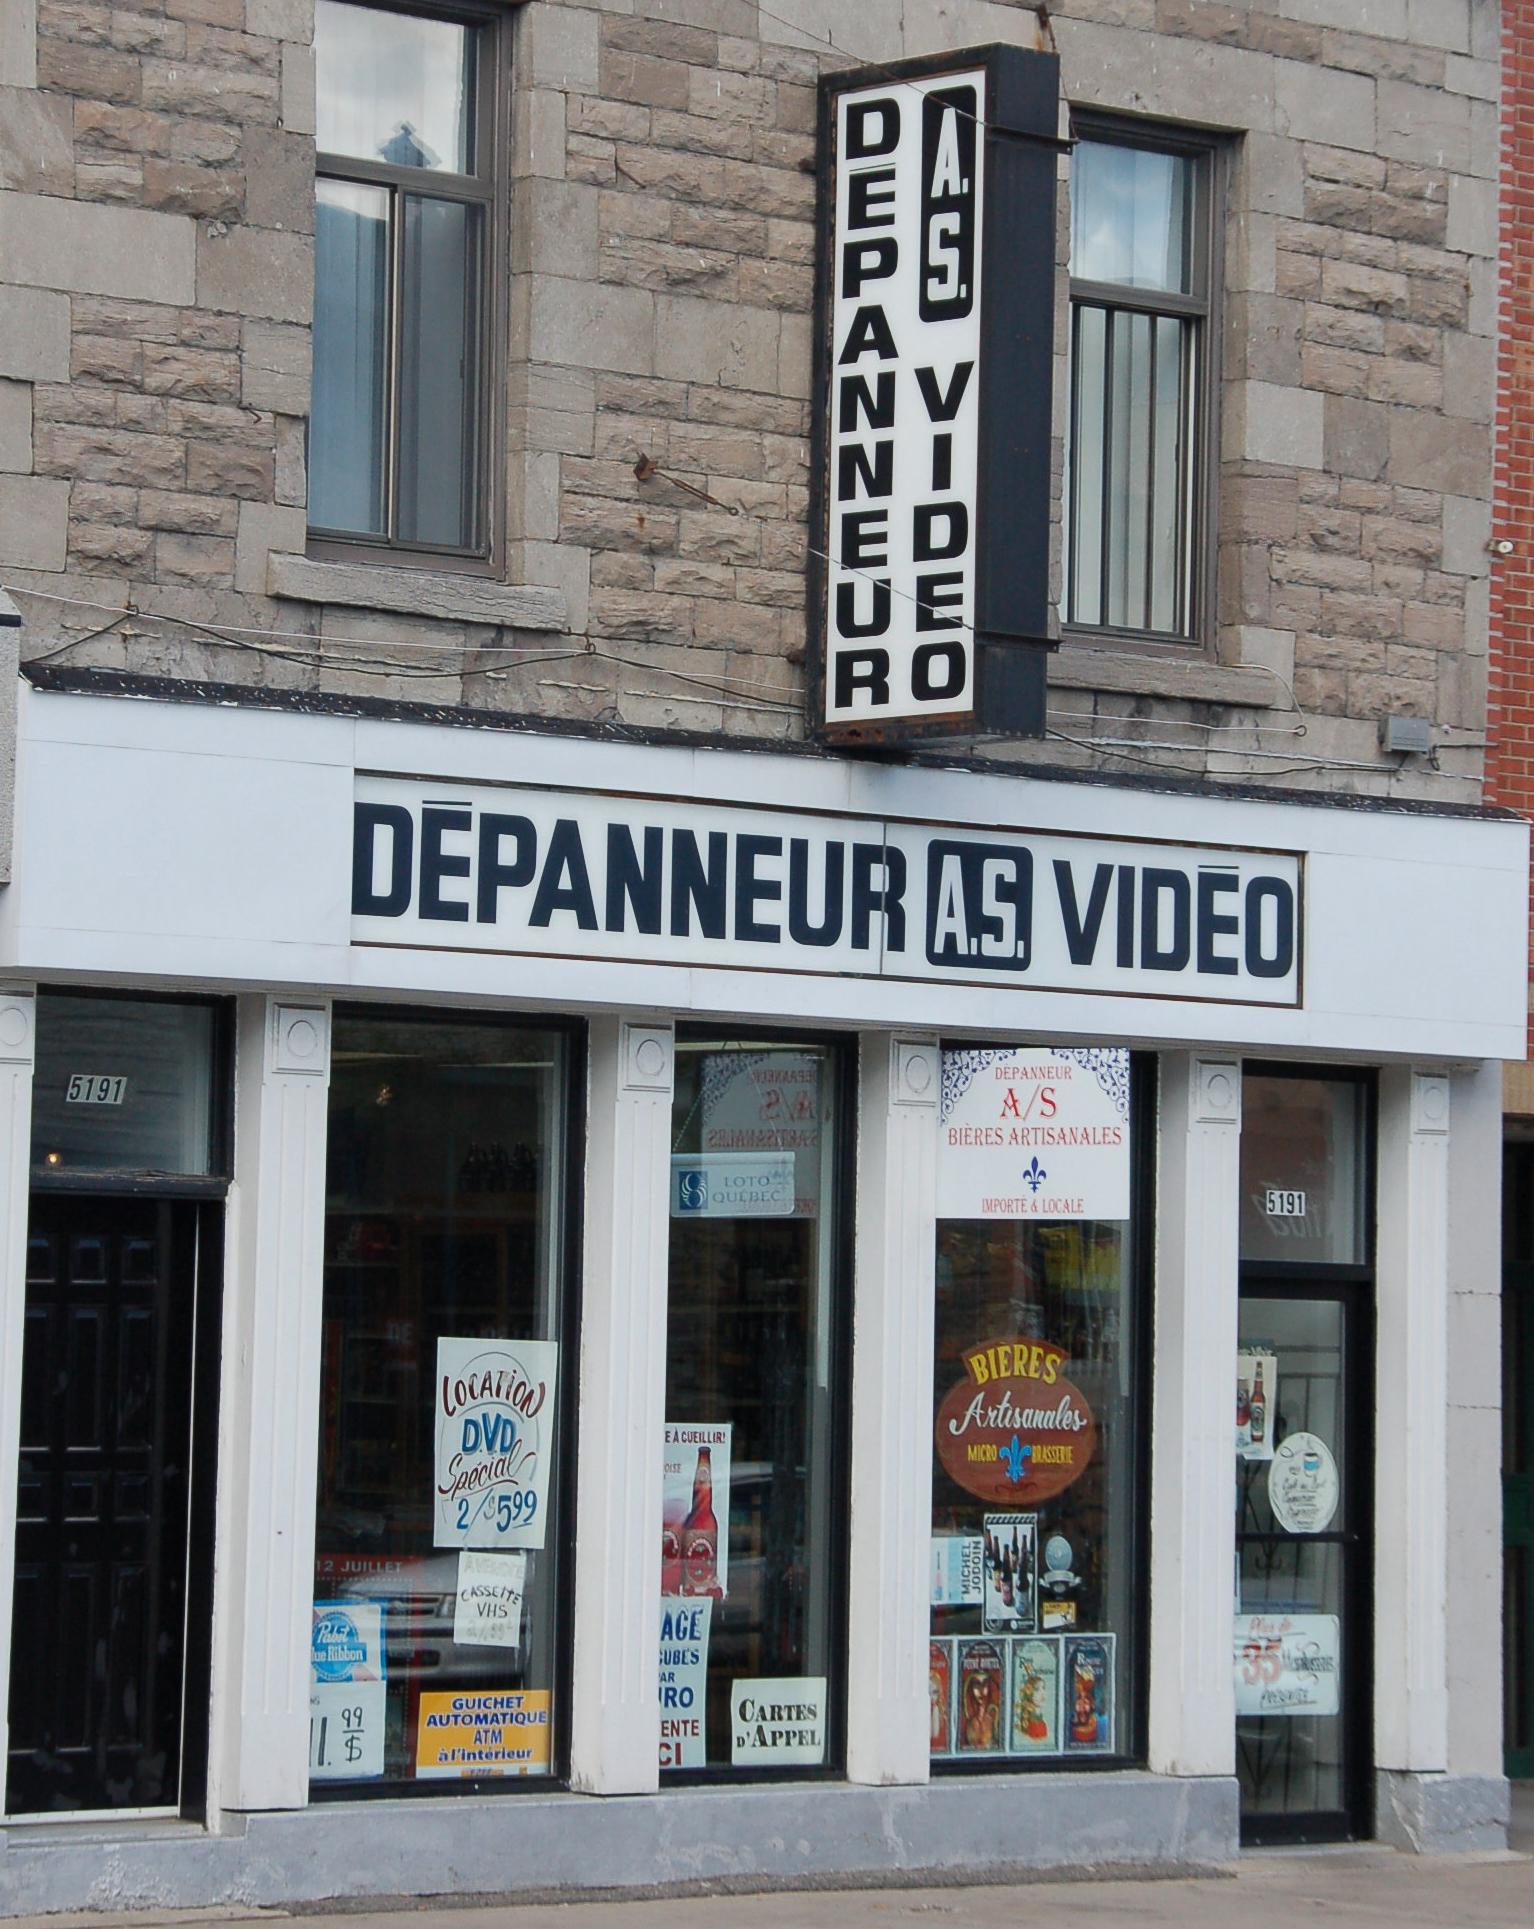 Der Dépanneur in Montreal entspricht dem Kölner Kiosk oder dem Berliner Späti